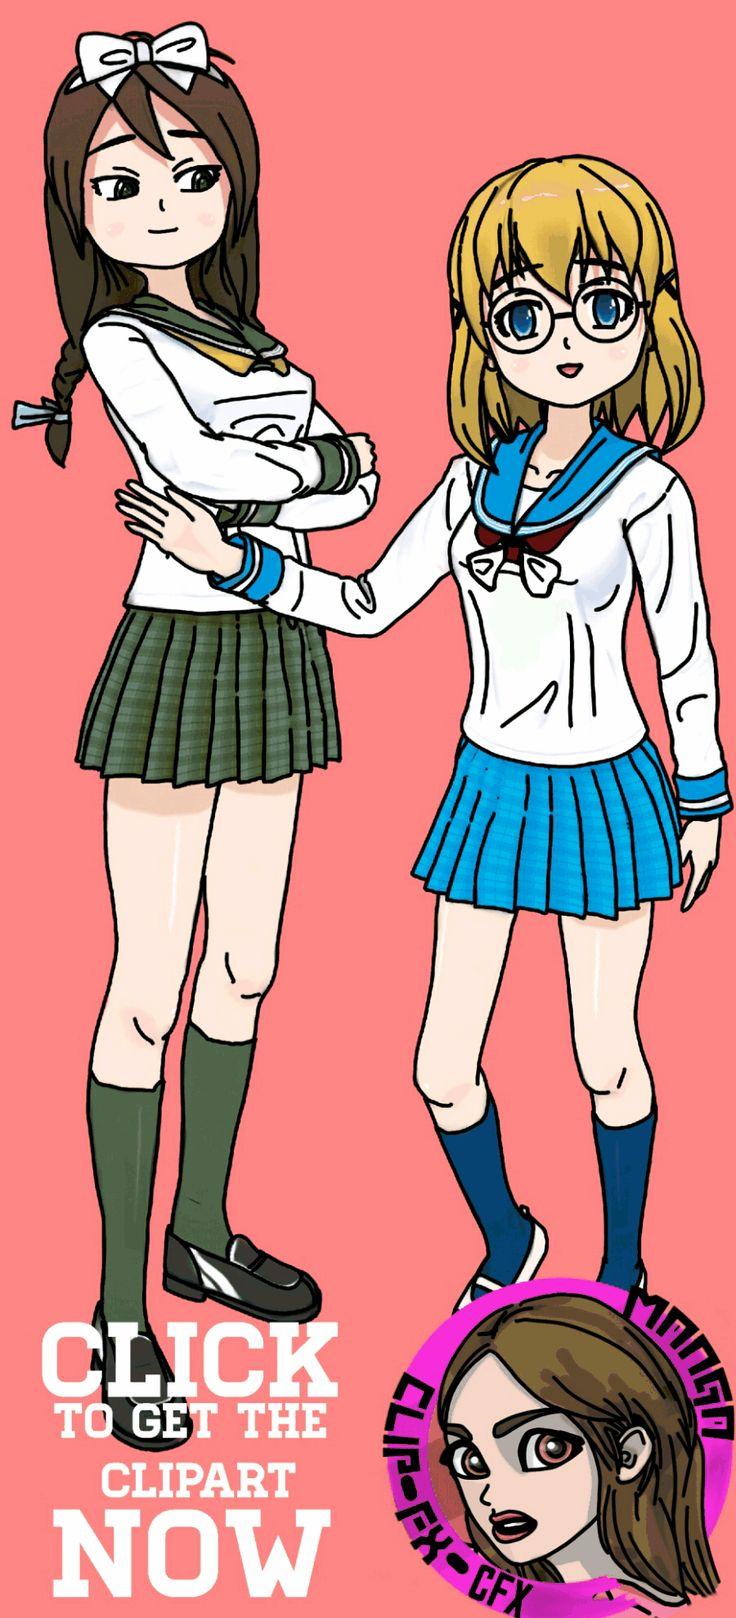 Manga kids / Children (Cartoon School Girl in Uniform)   This set includes:  6x Manga Girls (color)  6x Manga Girls (B&W)